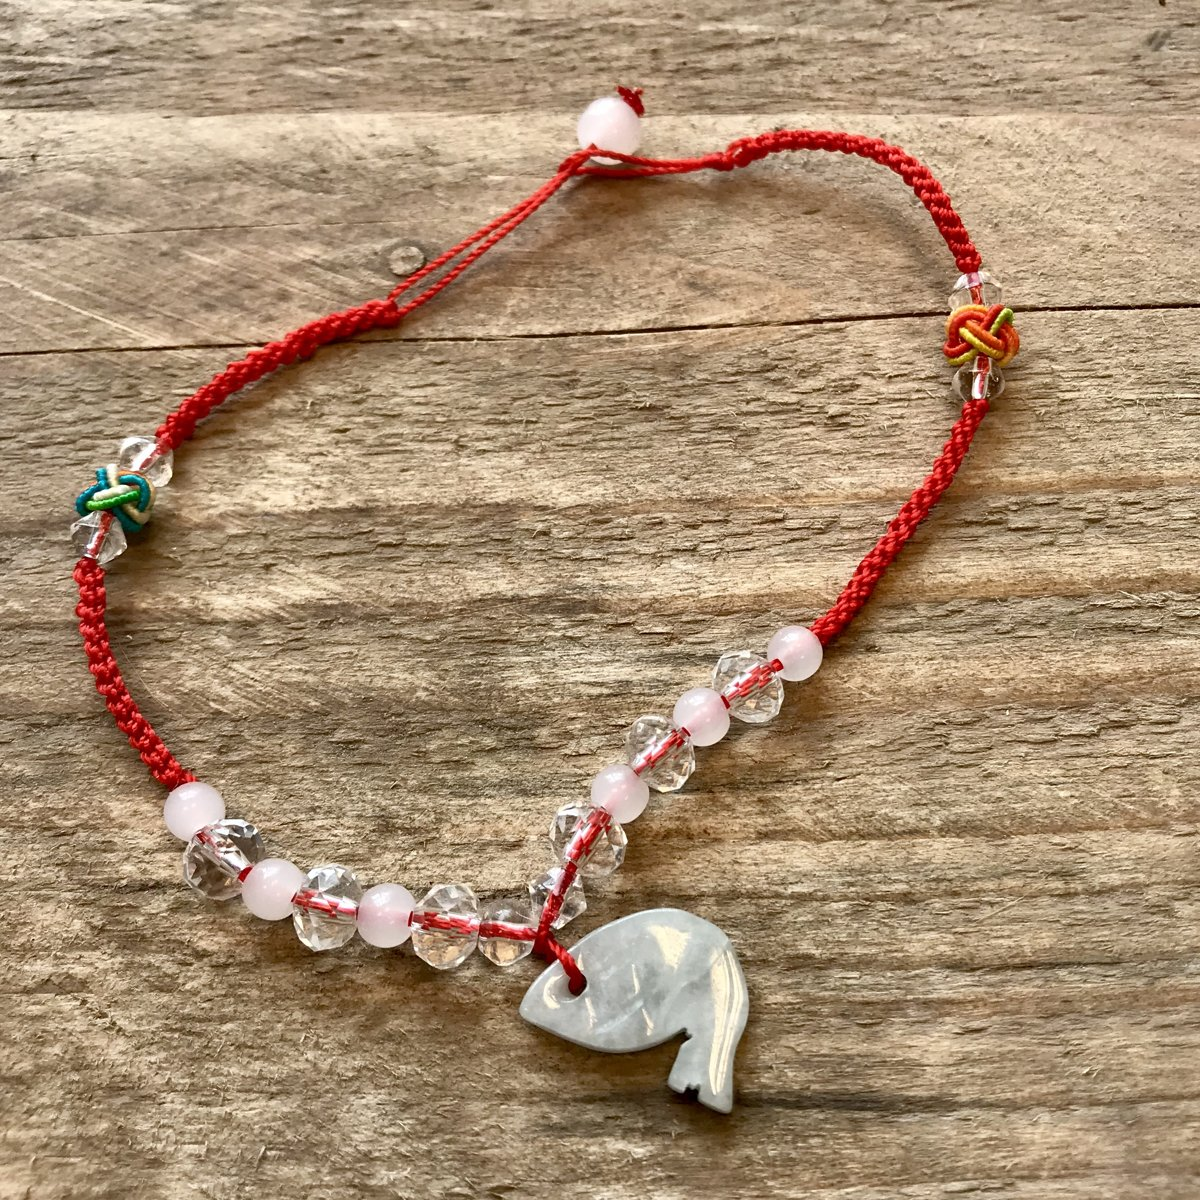 Jade | enkelbandje | rood kopen